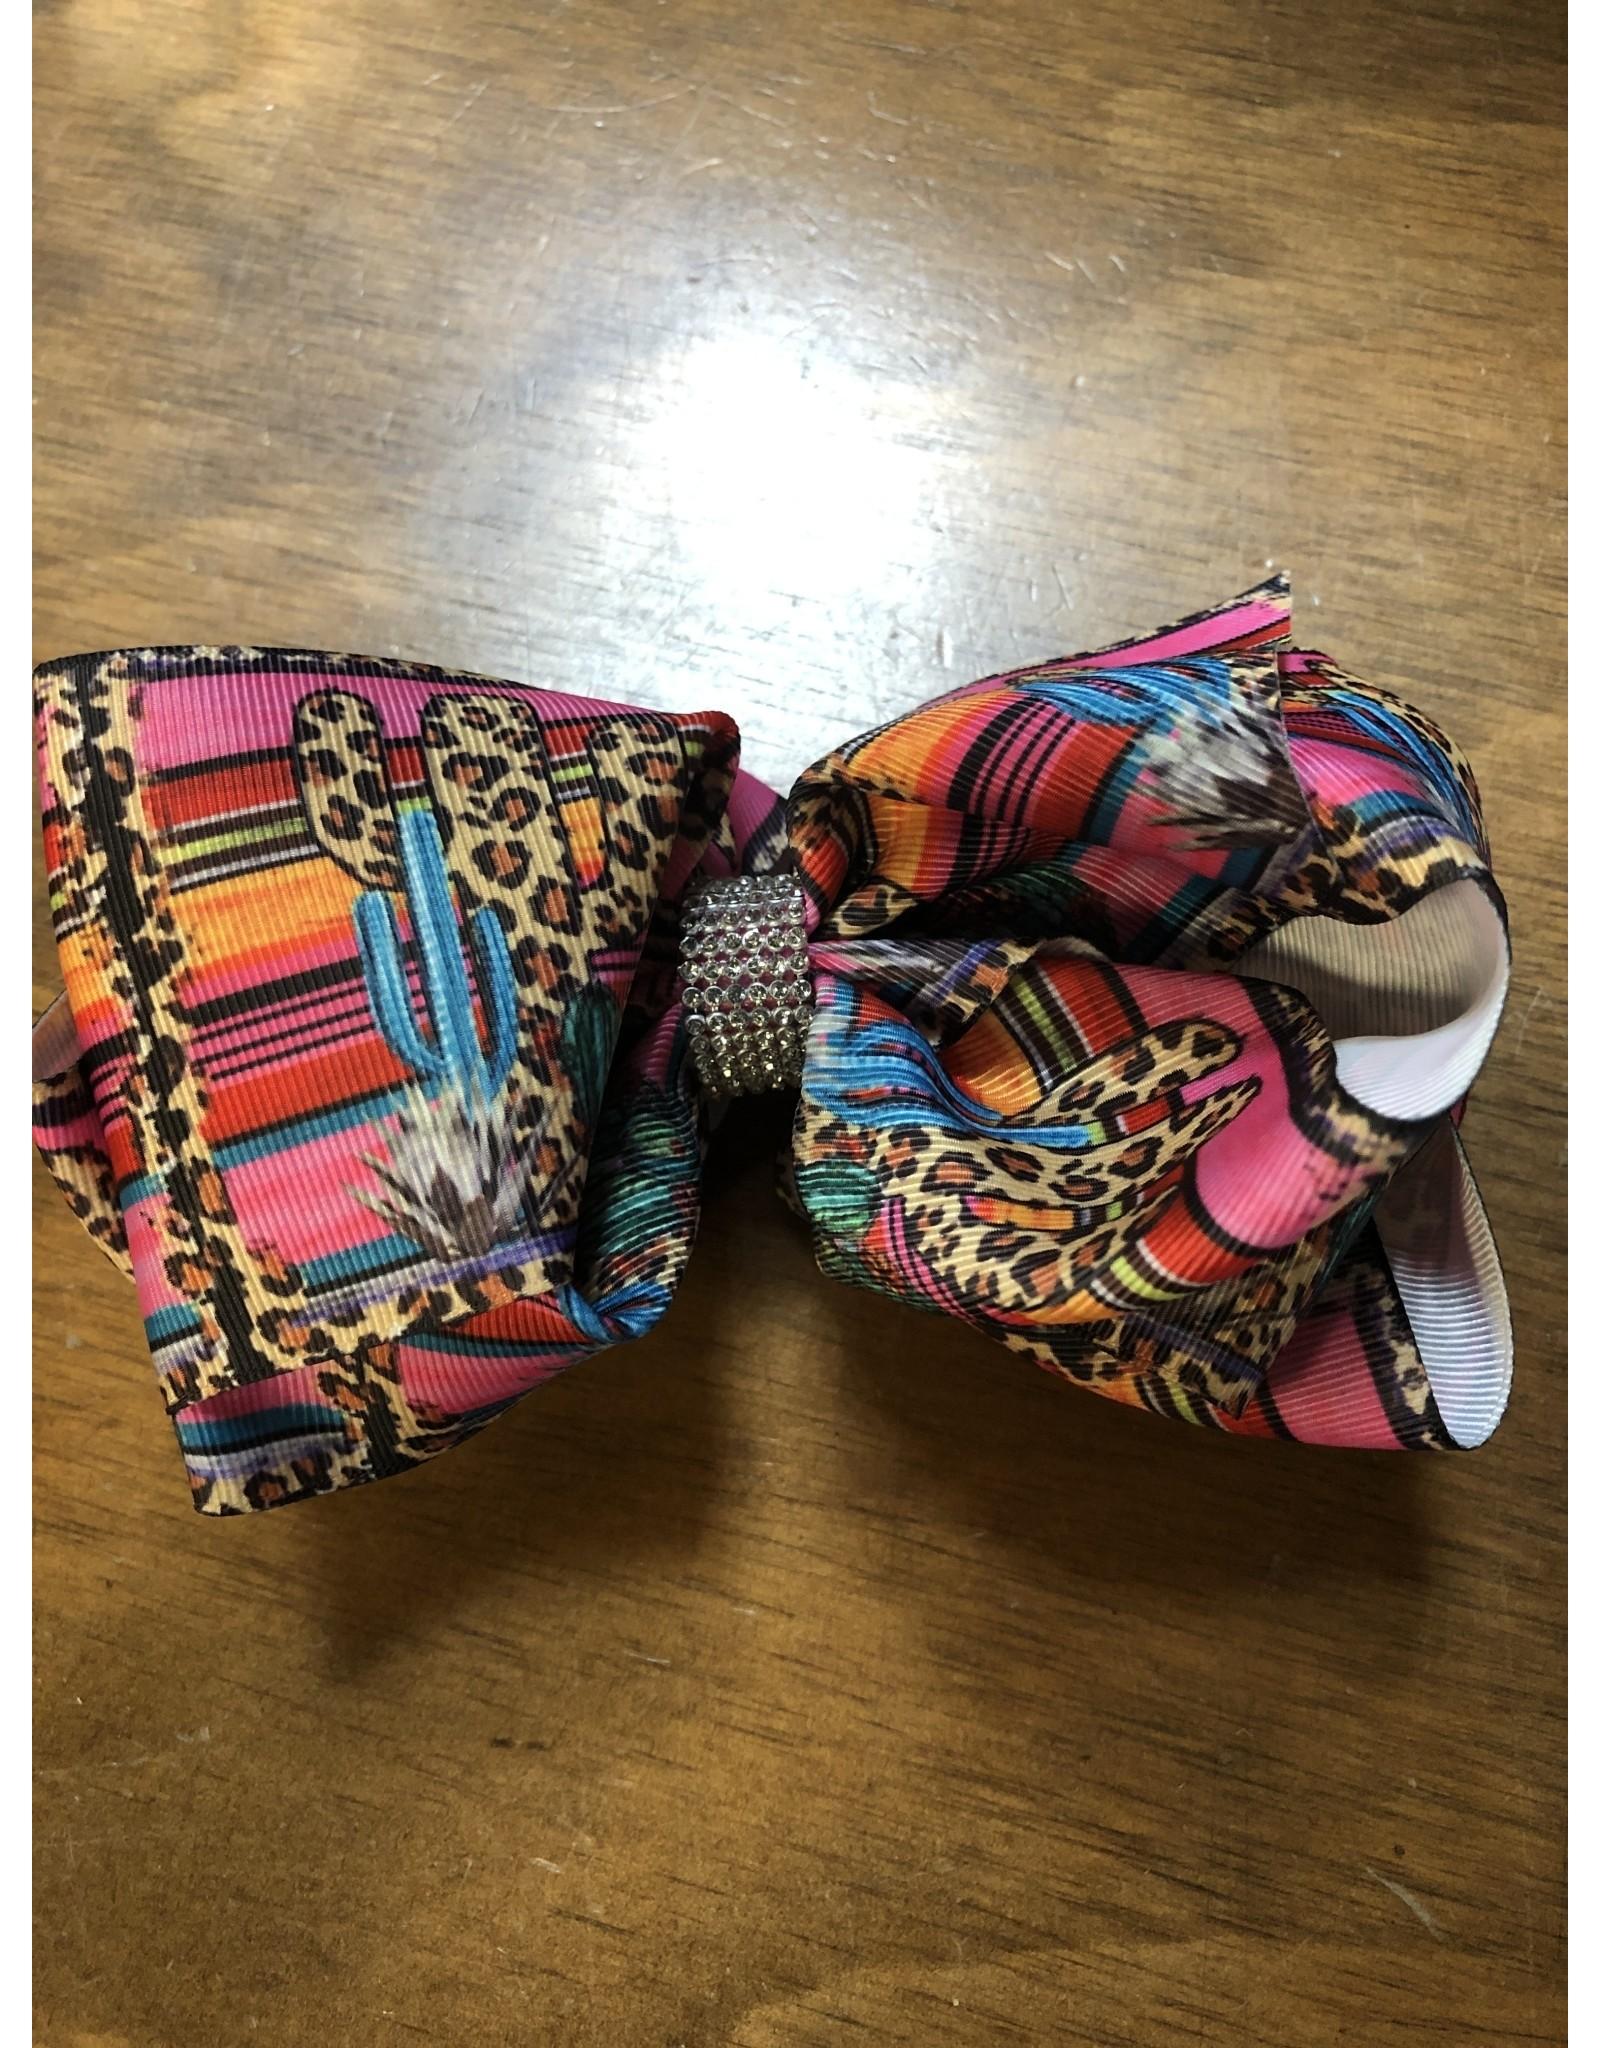 The Burlap Sack Bling Bows